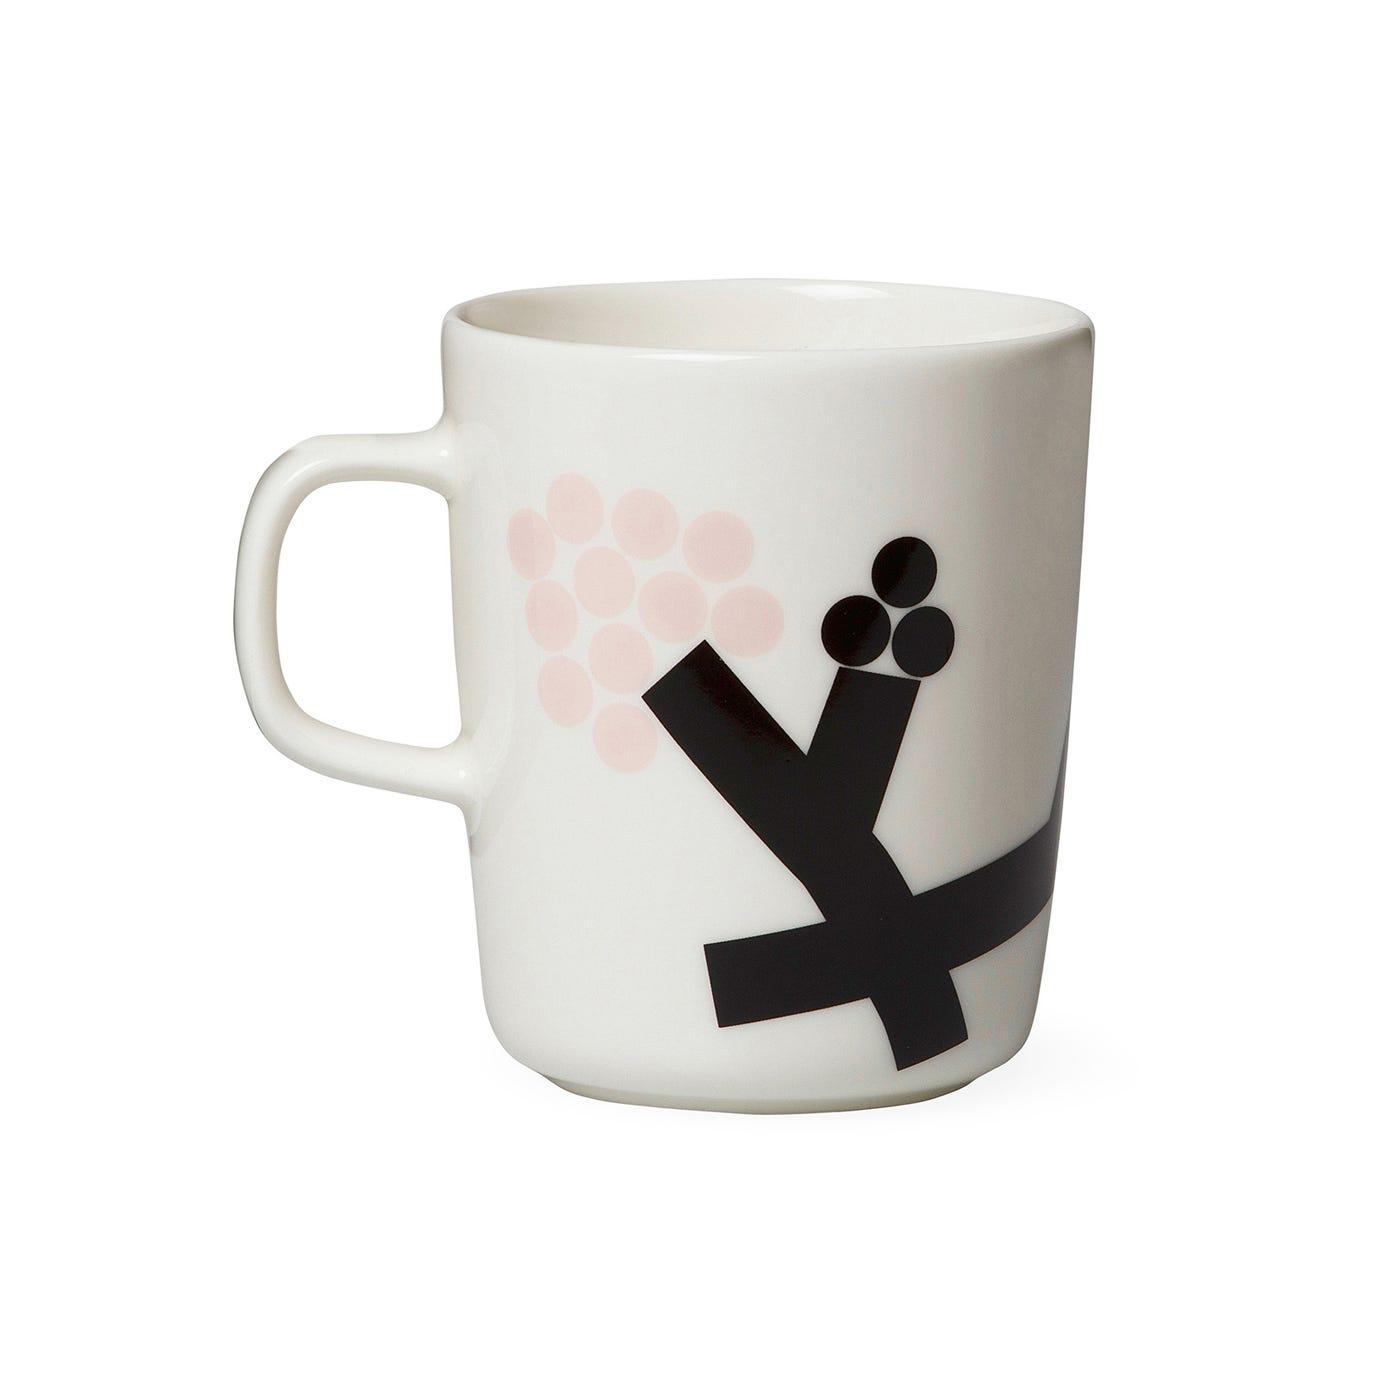 Hortensie Mug 2.5dl